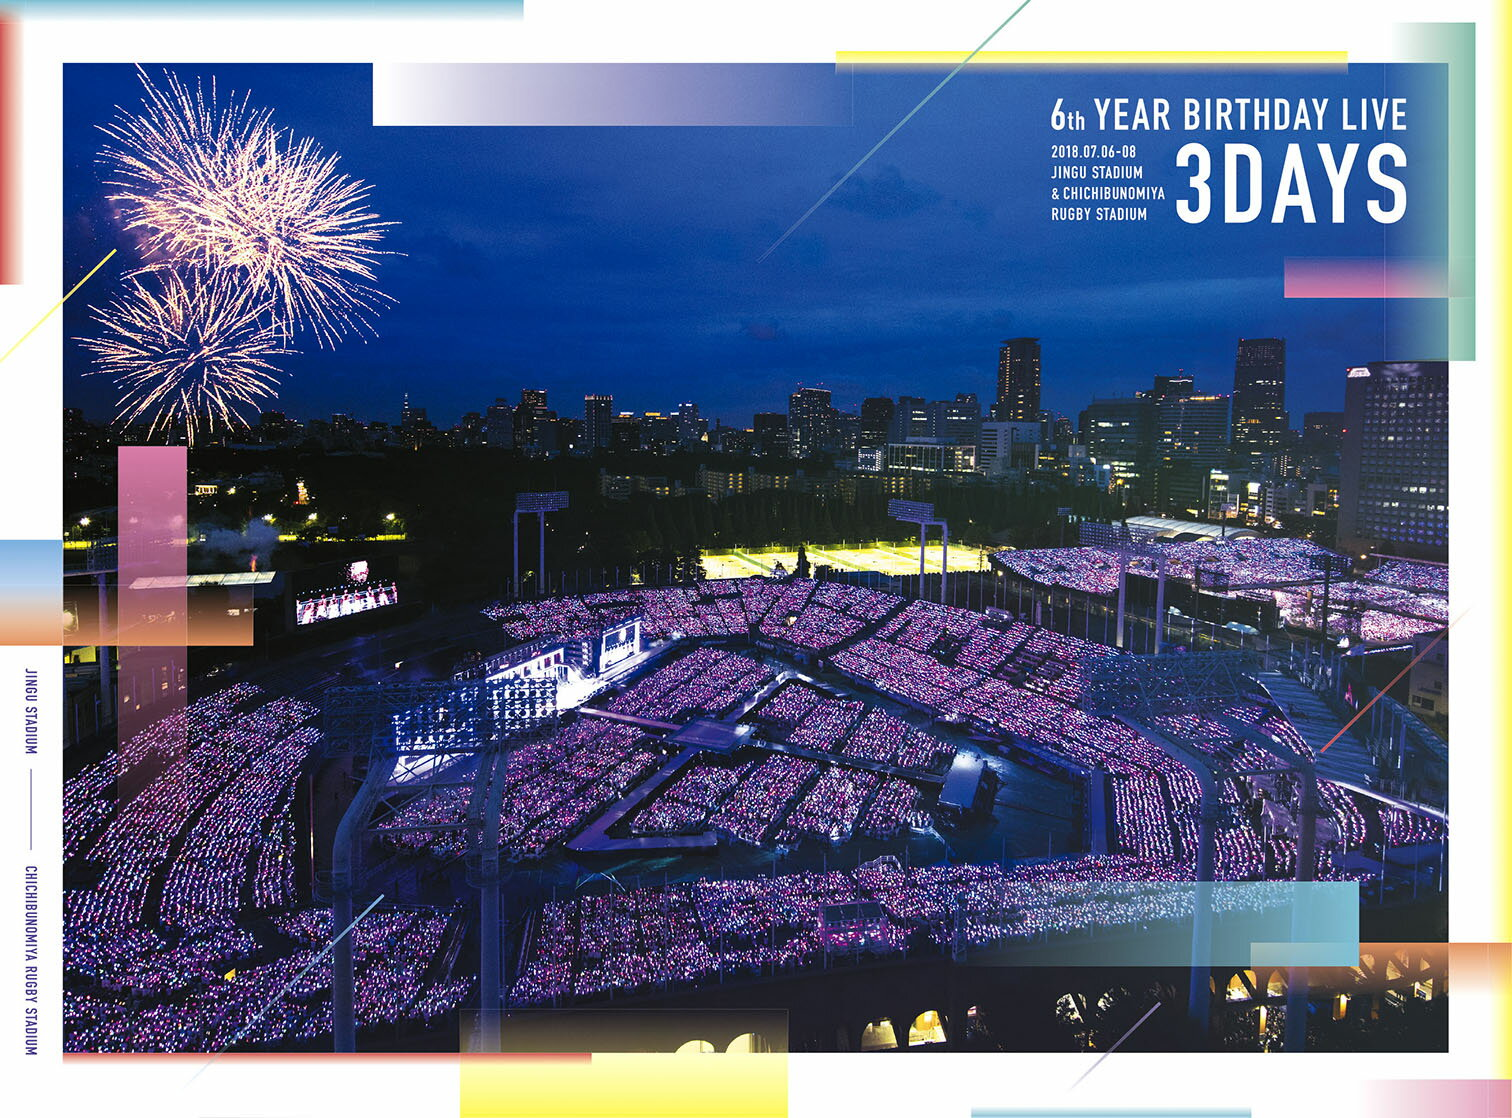 6th YEAR BIRTHDAY LIVE(完全生産限定盤)【Blu-ray】